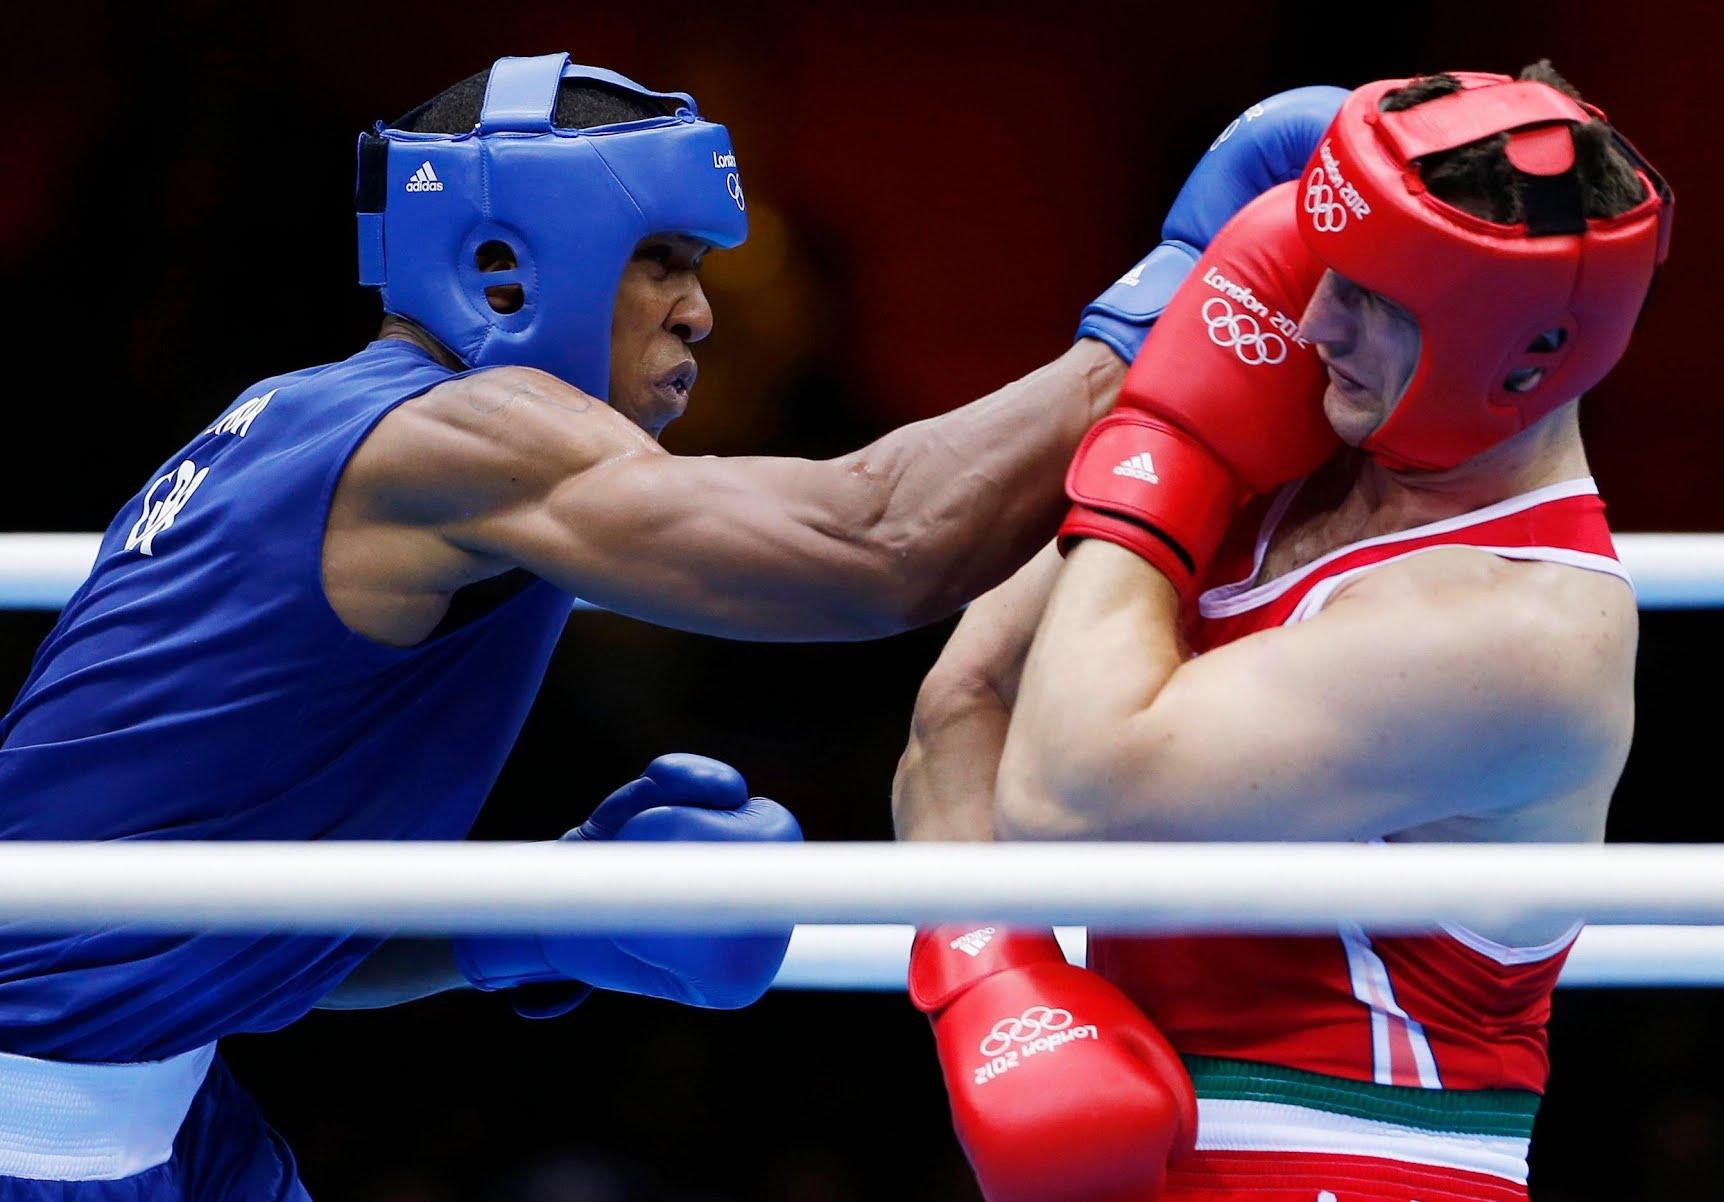 Anthony Joshua beat Italian Roberto Cammarelle in the super-heavyweight final of the 2012 Olympics